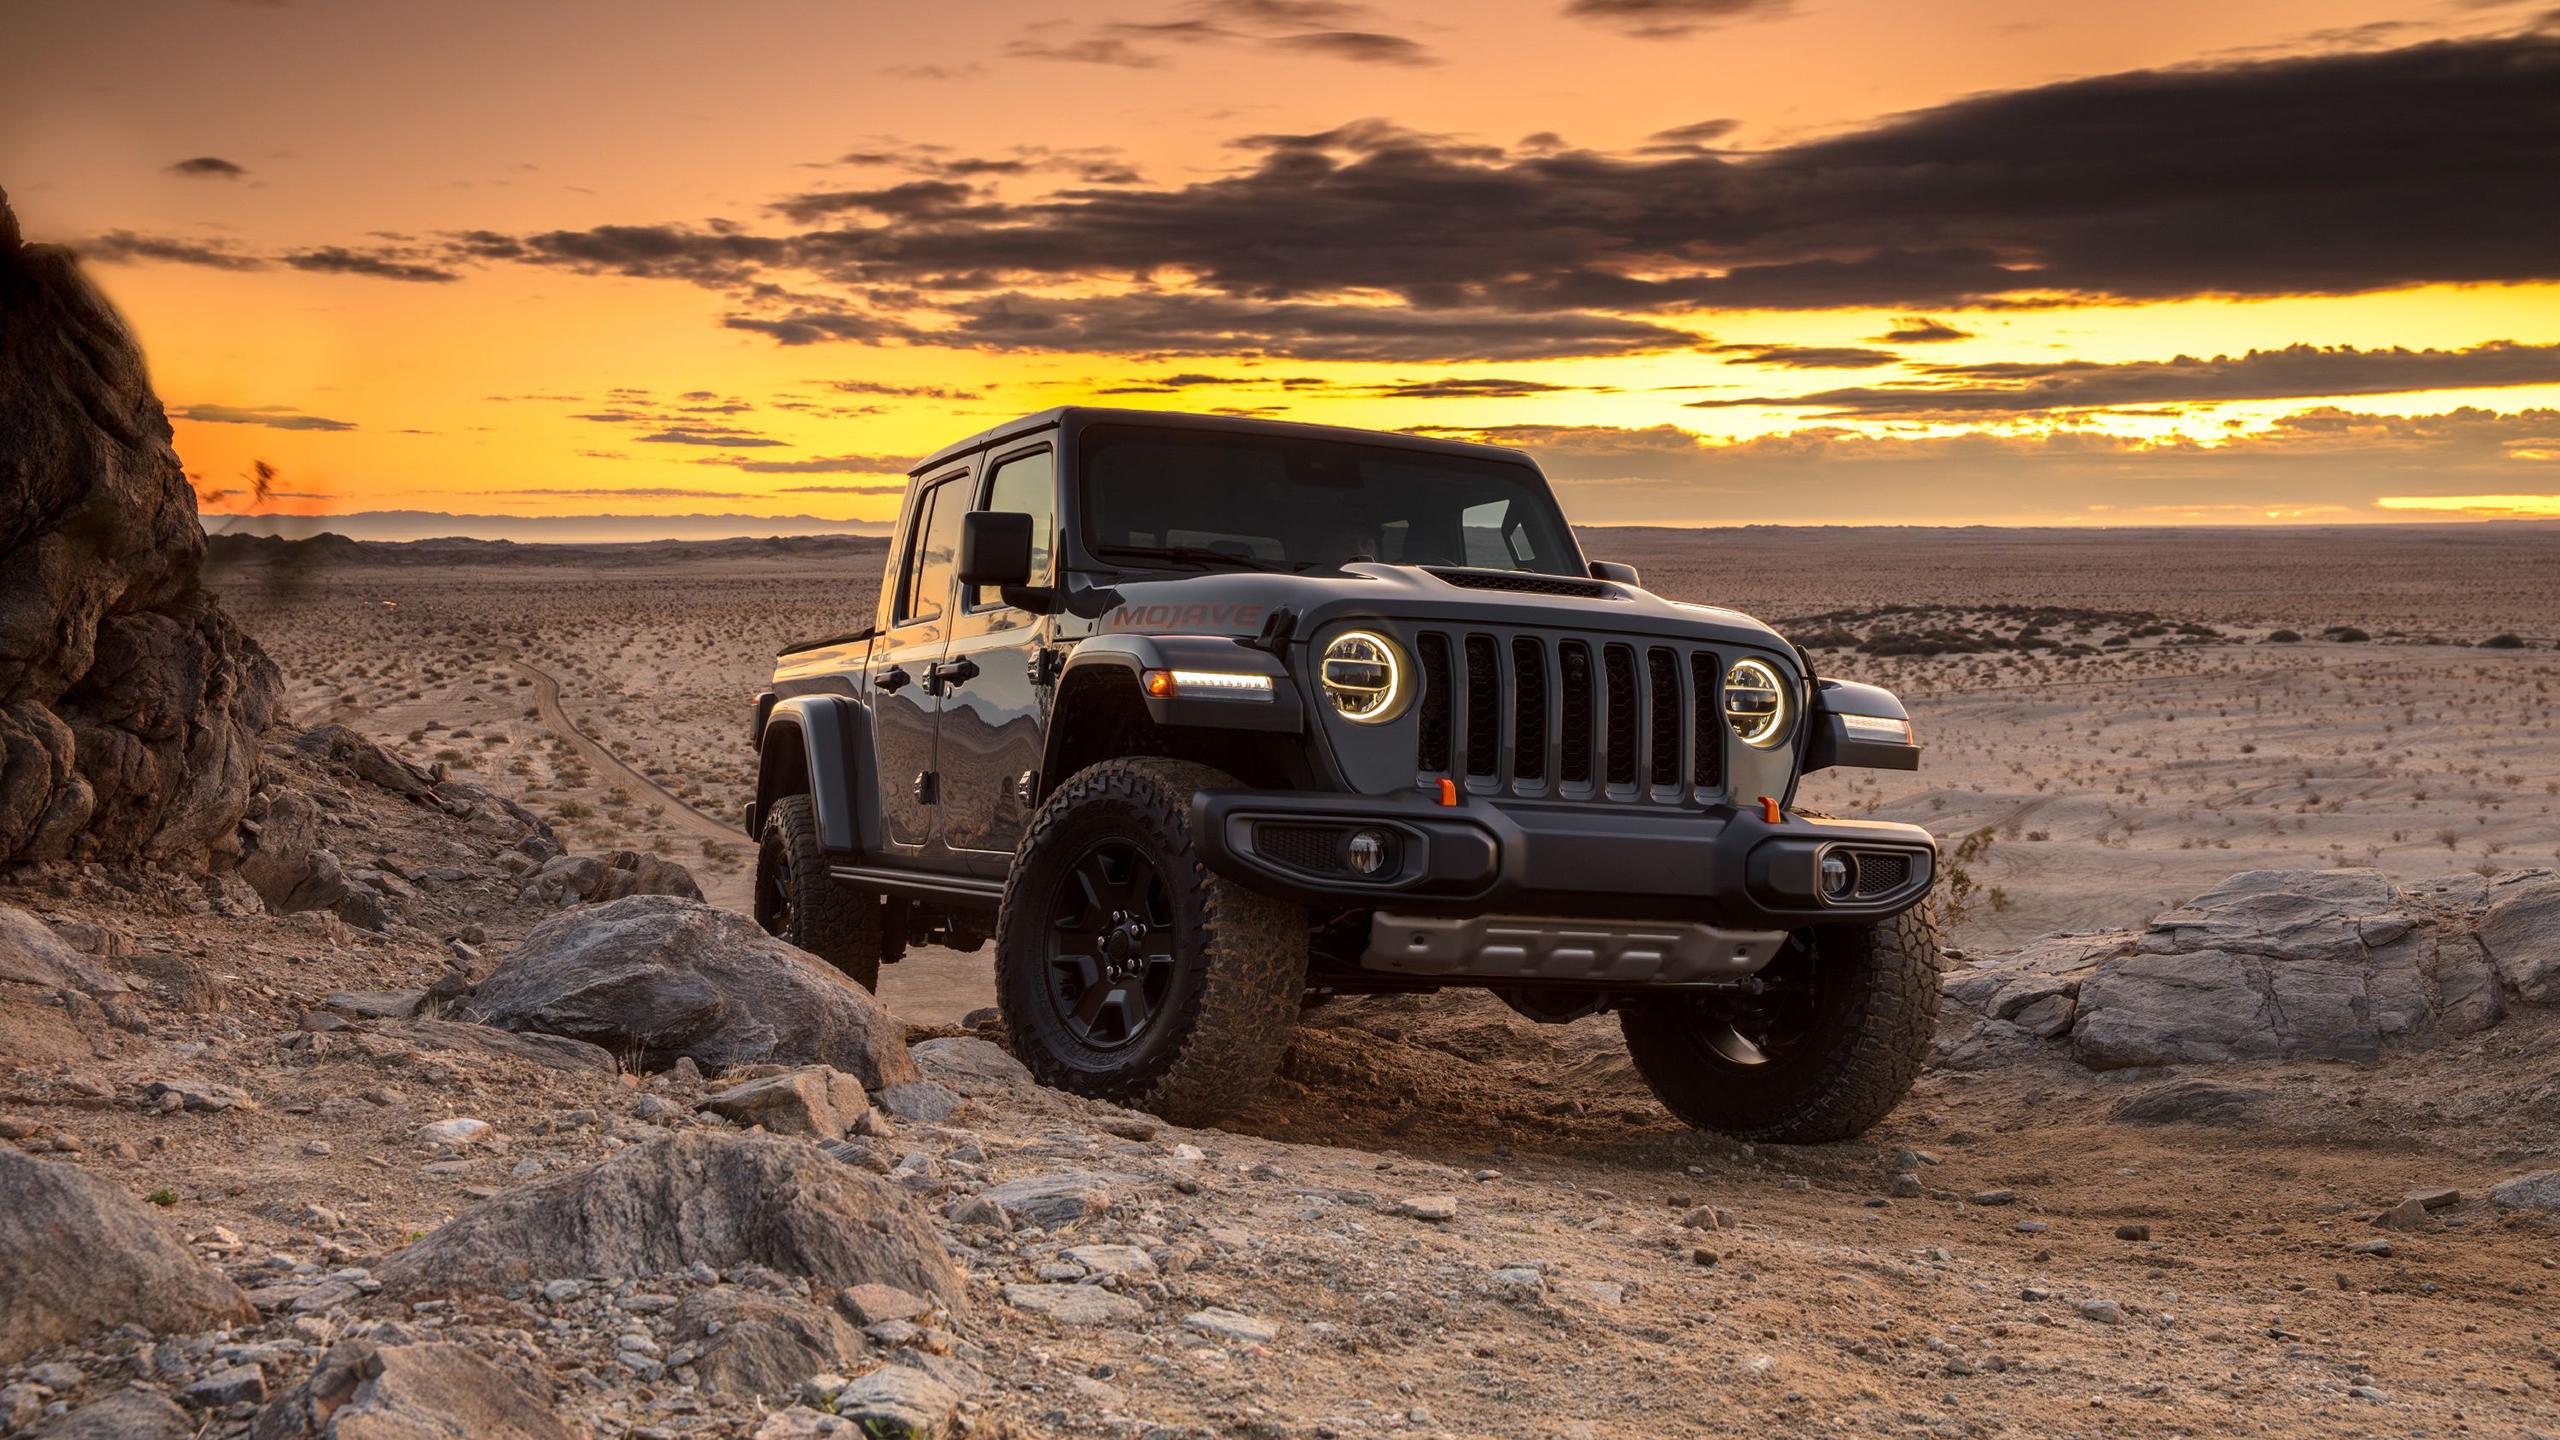 2020 jeep gladiator mojave HD